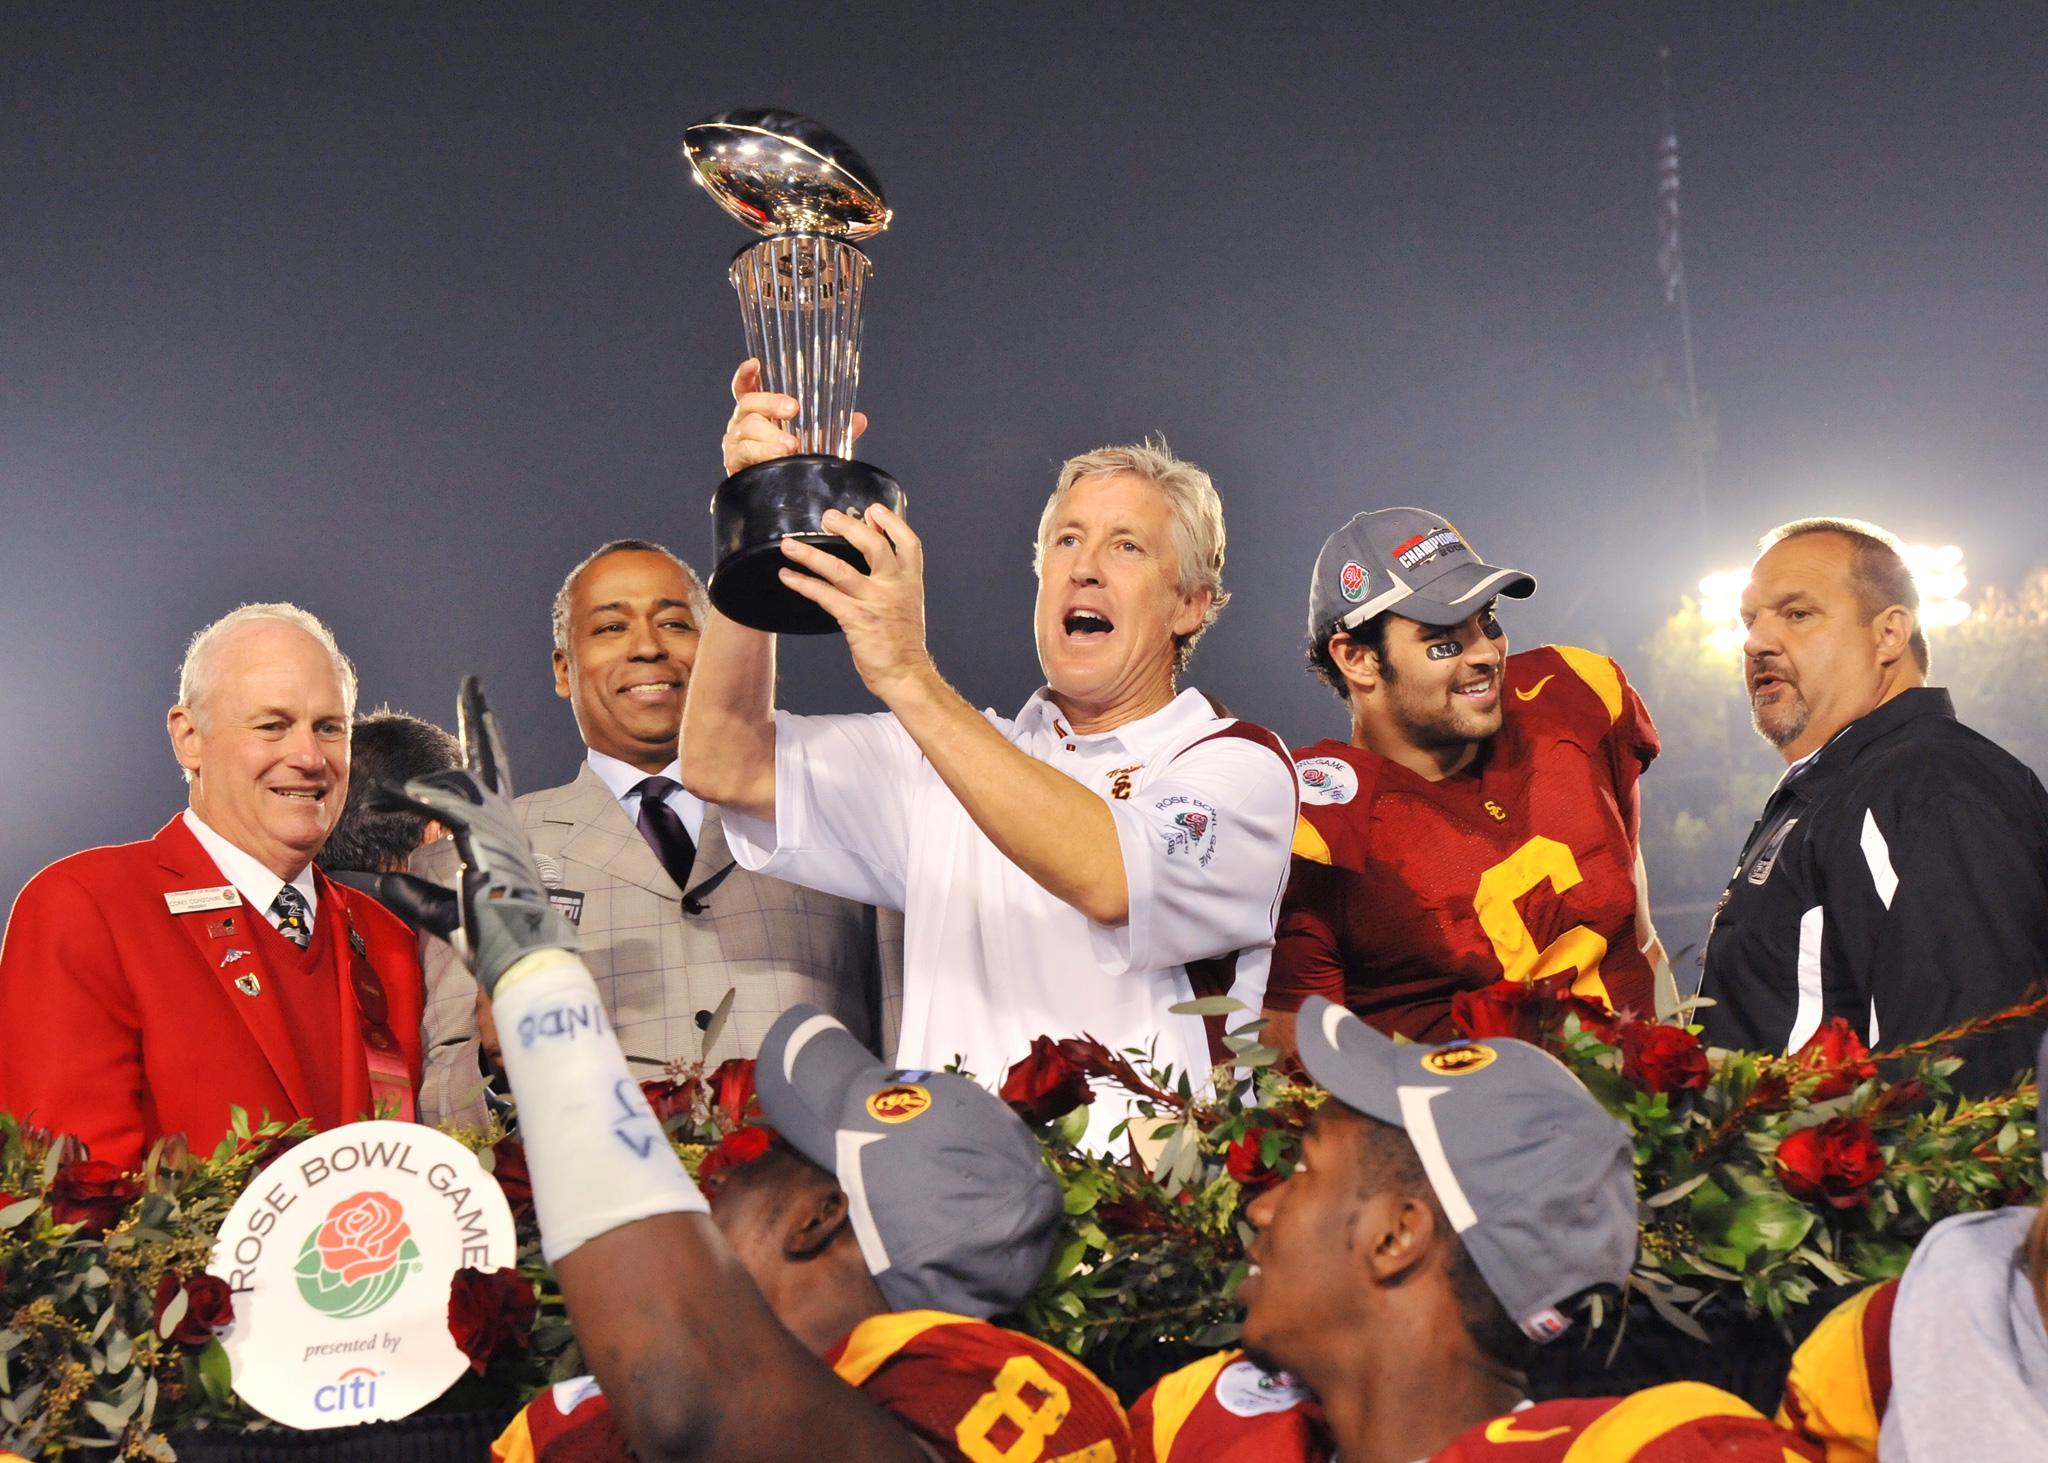 2009 Rose Bowl